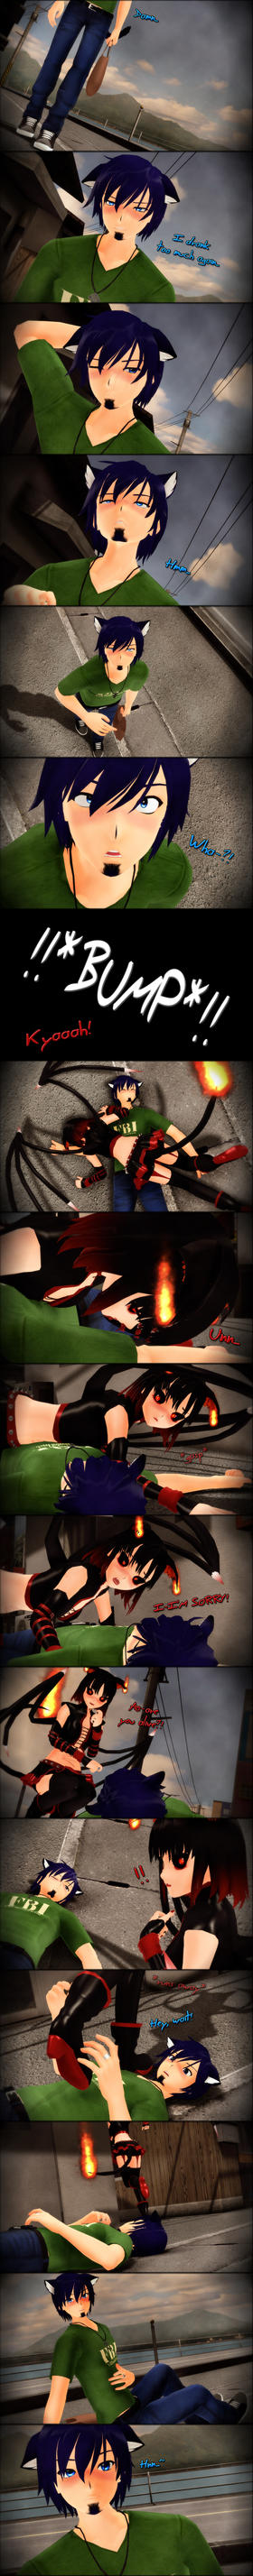 Comics-Silly demon...- by TehPuroisen